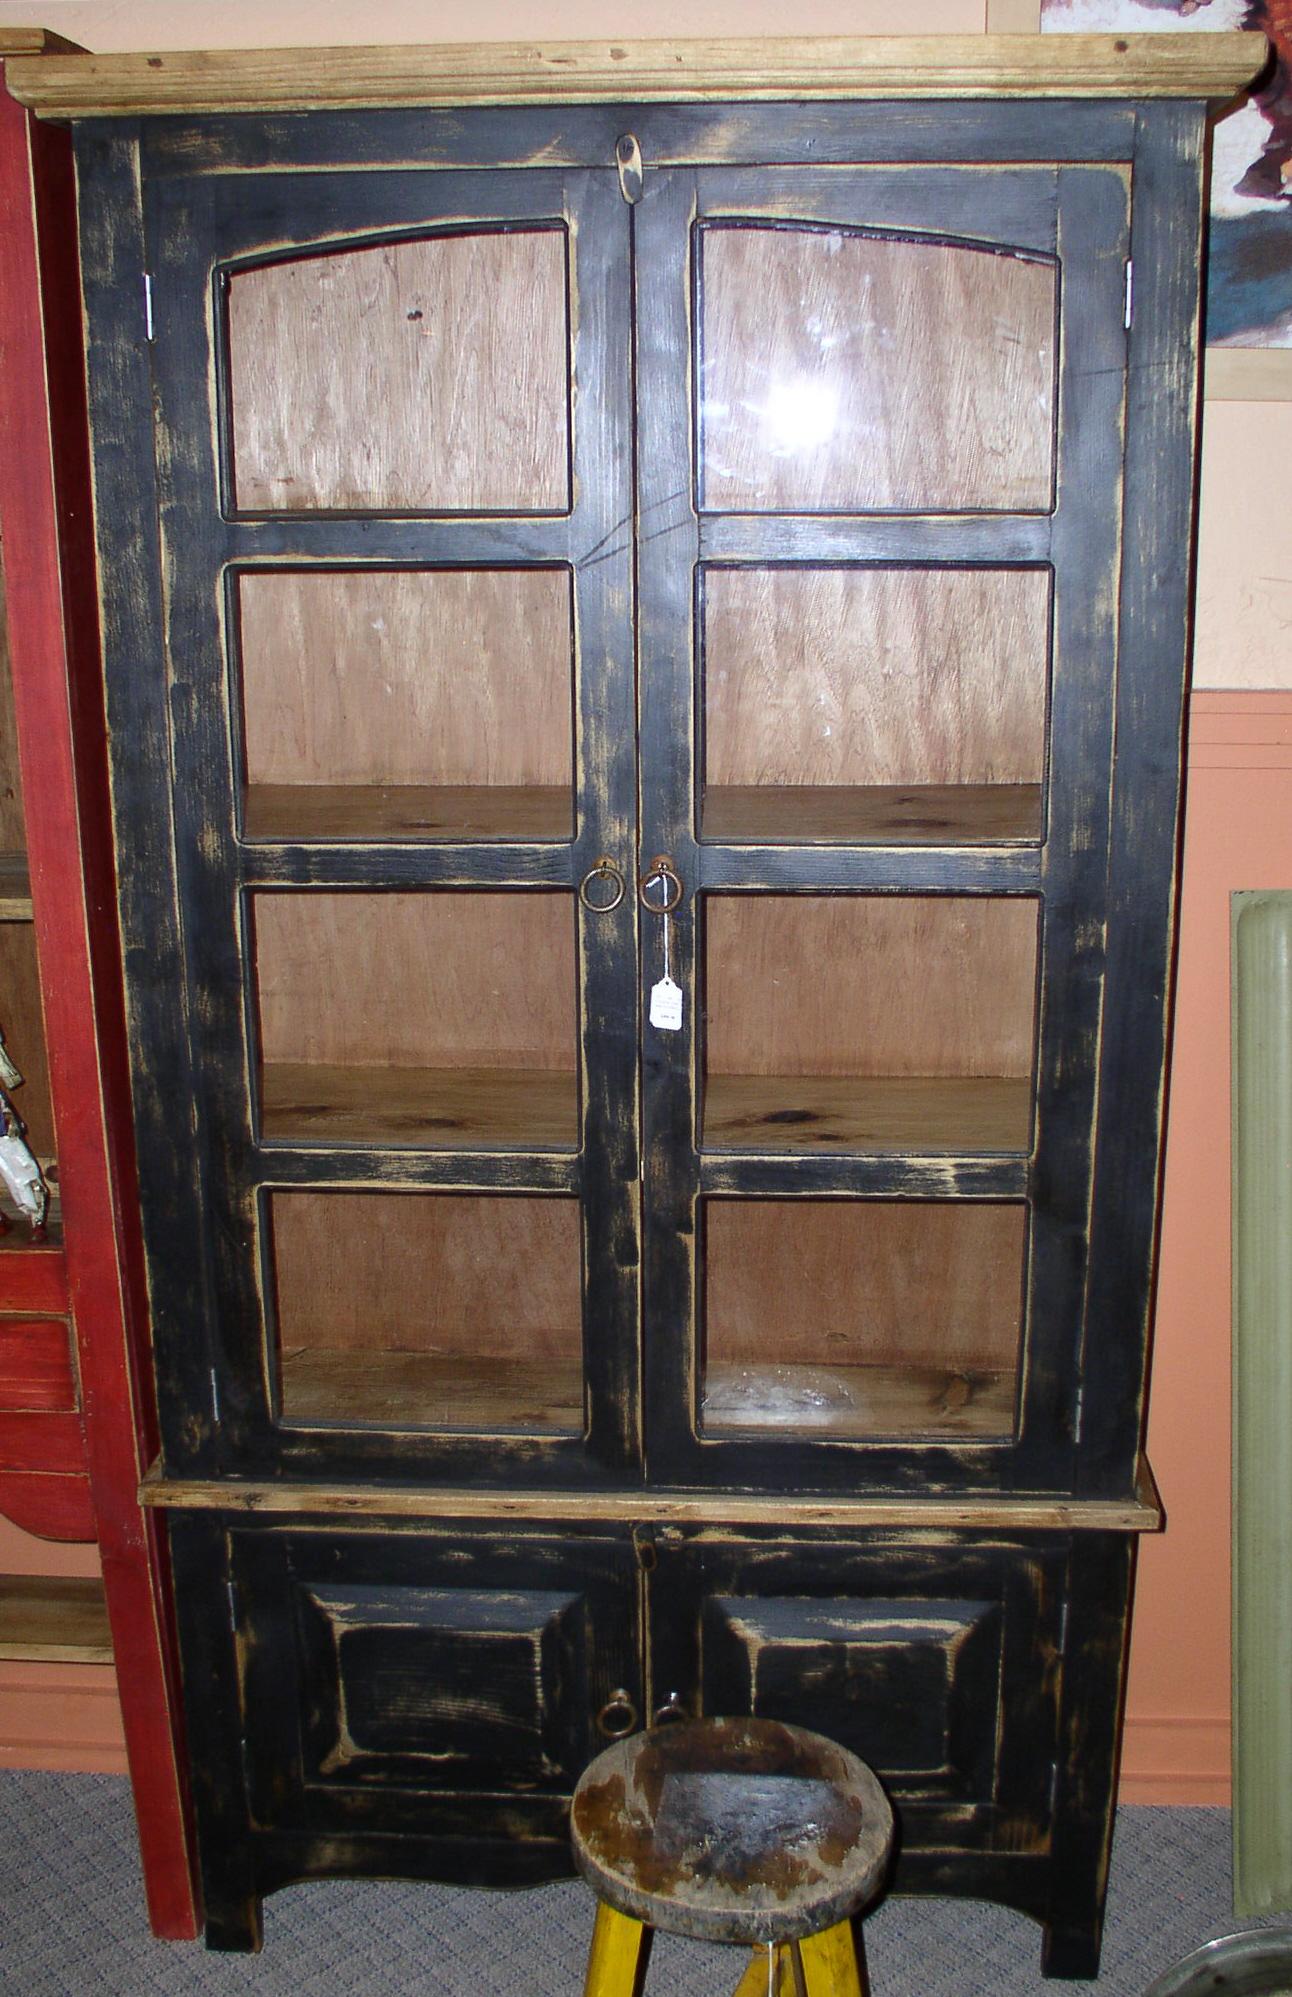 #4015 CHIHUAHUA BOOKCASE BLK GLASS DOORS 39 X 13X72 389 .jpg